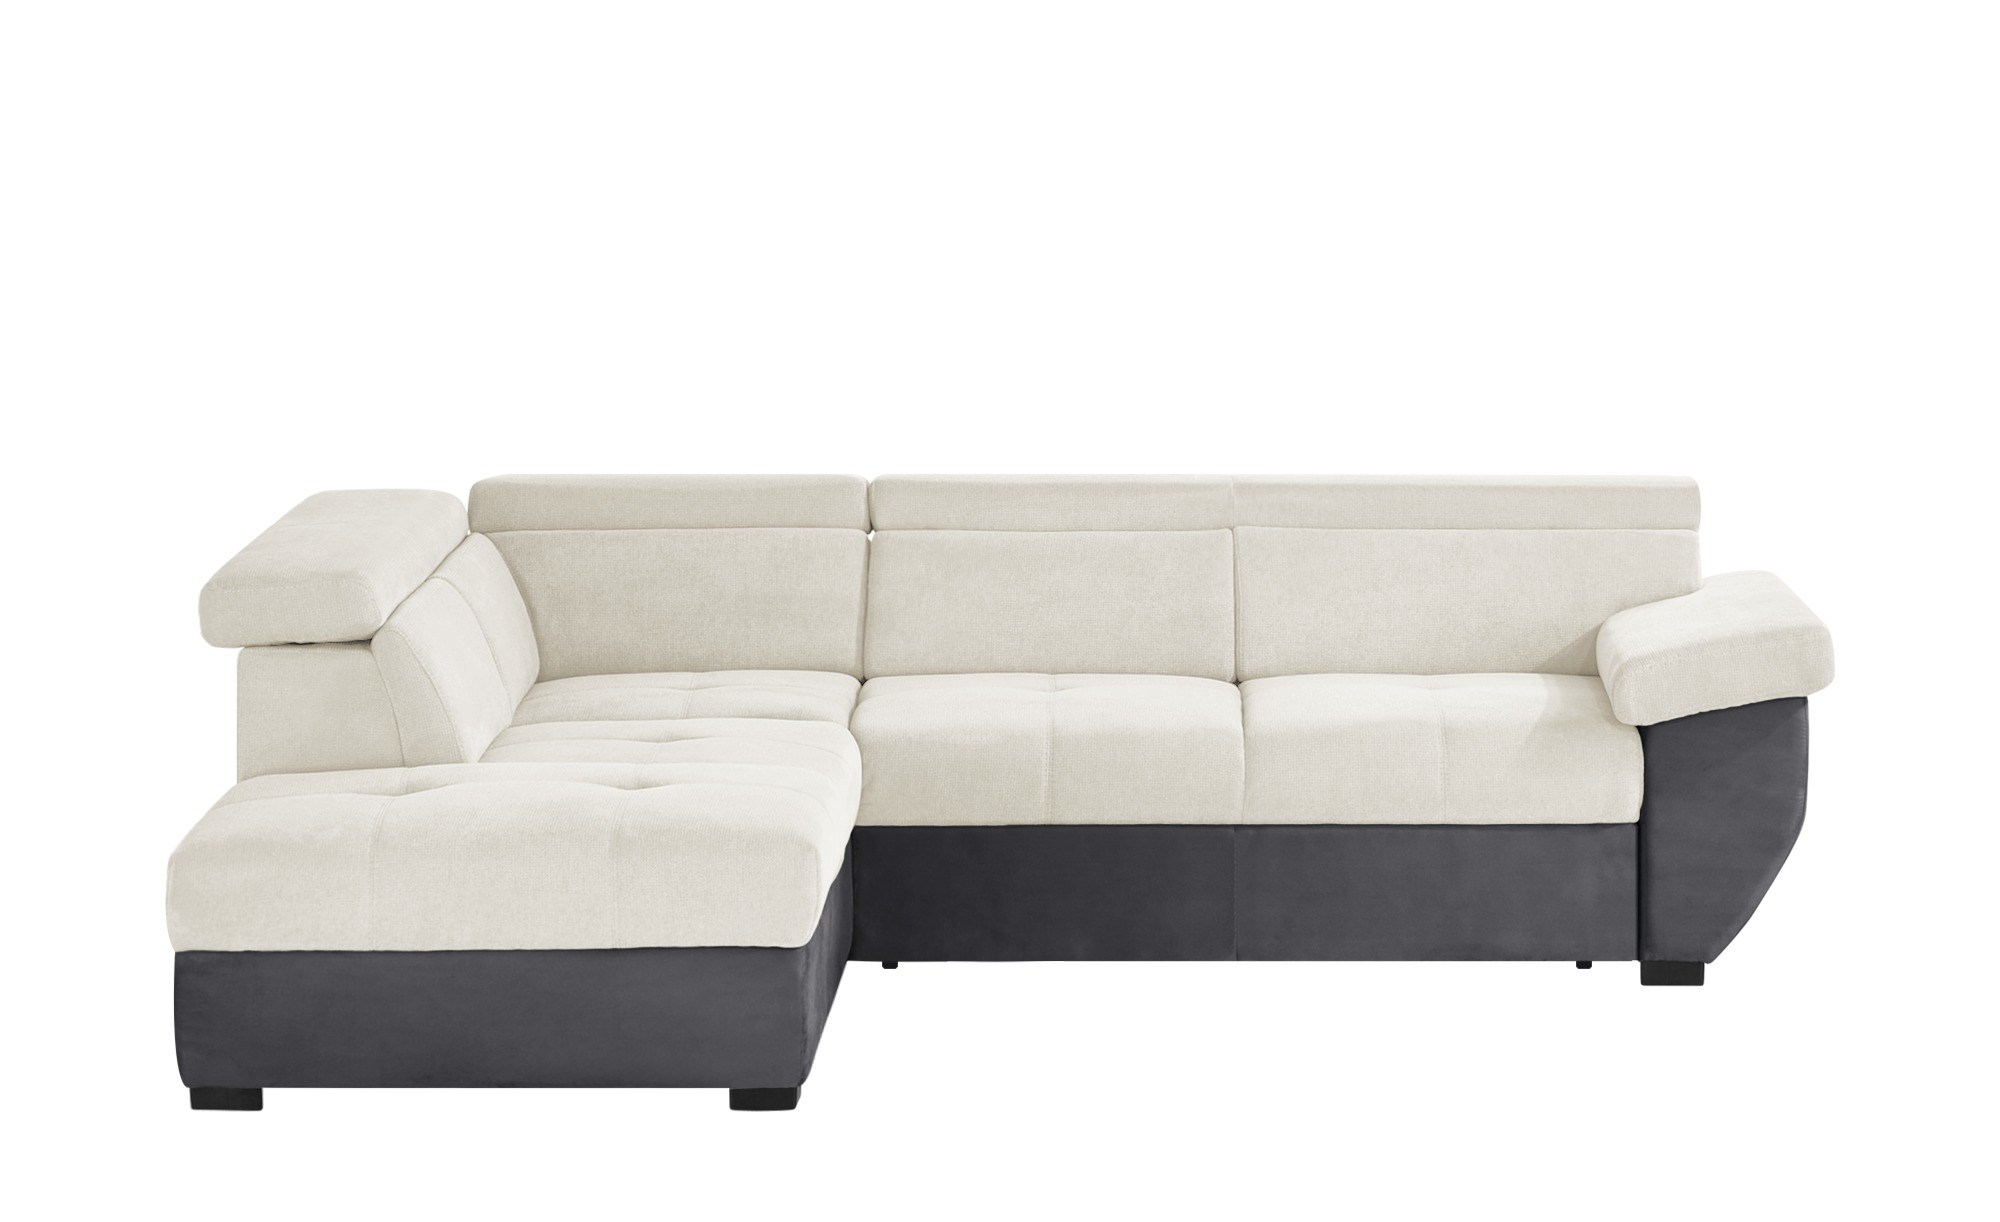 Gunstige Schlafsofas Online Bestellen Sofa Leder Stoff Kombination Velocity Sofa Big Lots Billig Big Sofa Kaufen Eck L Ecksofa Ecksofas Big Sofa Kaufen